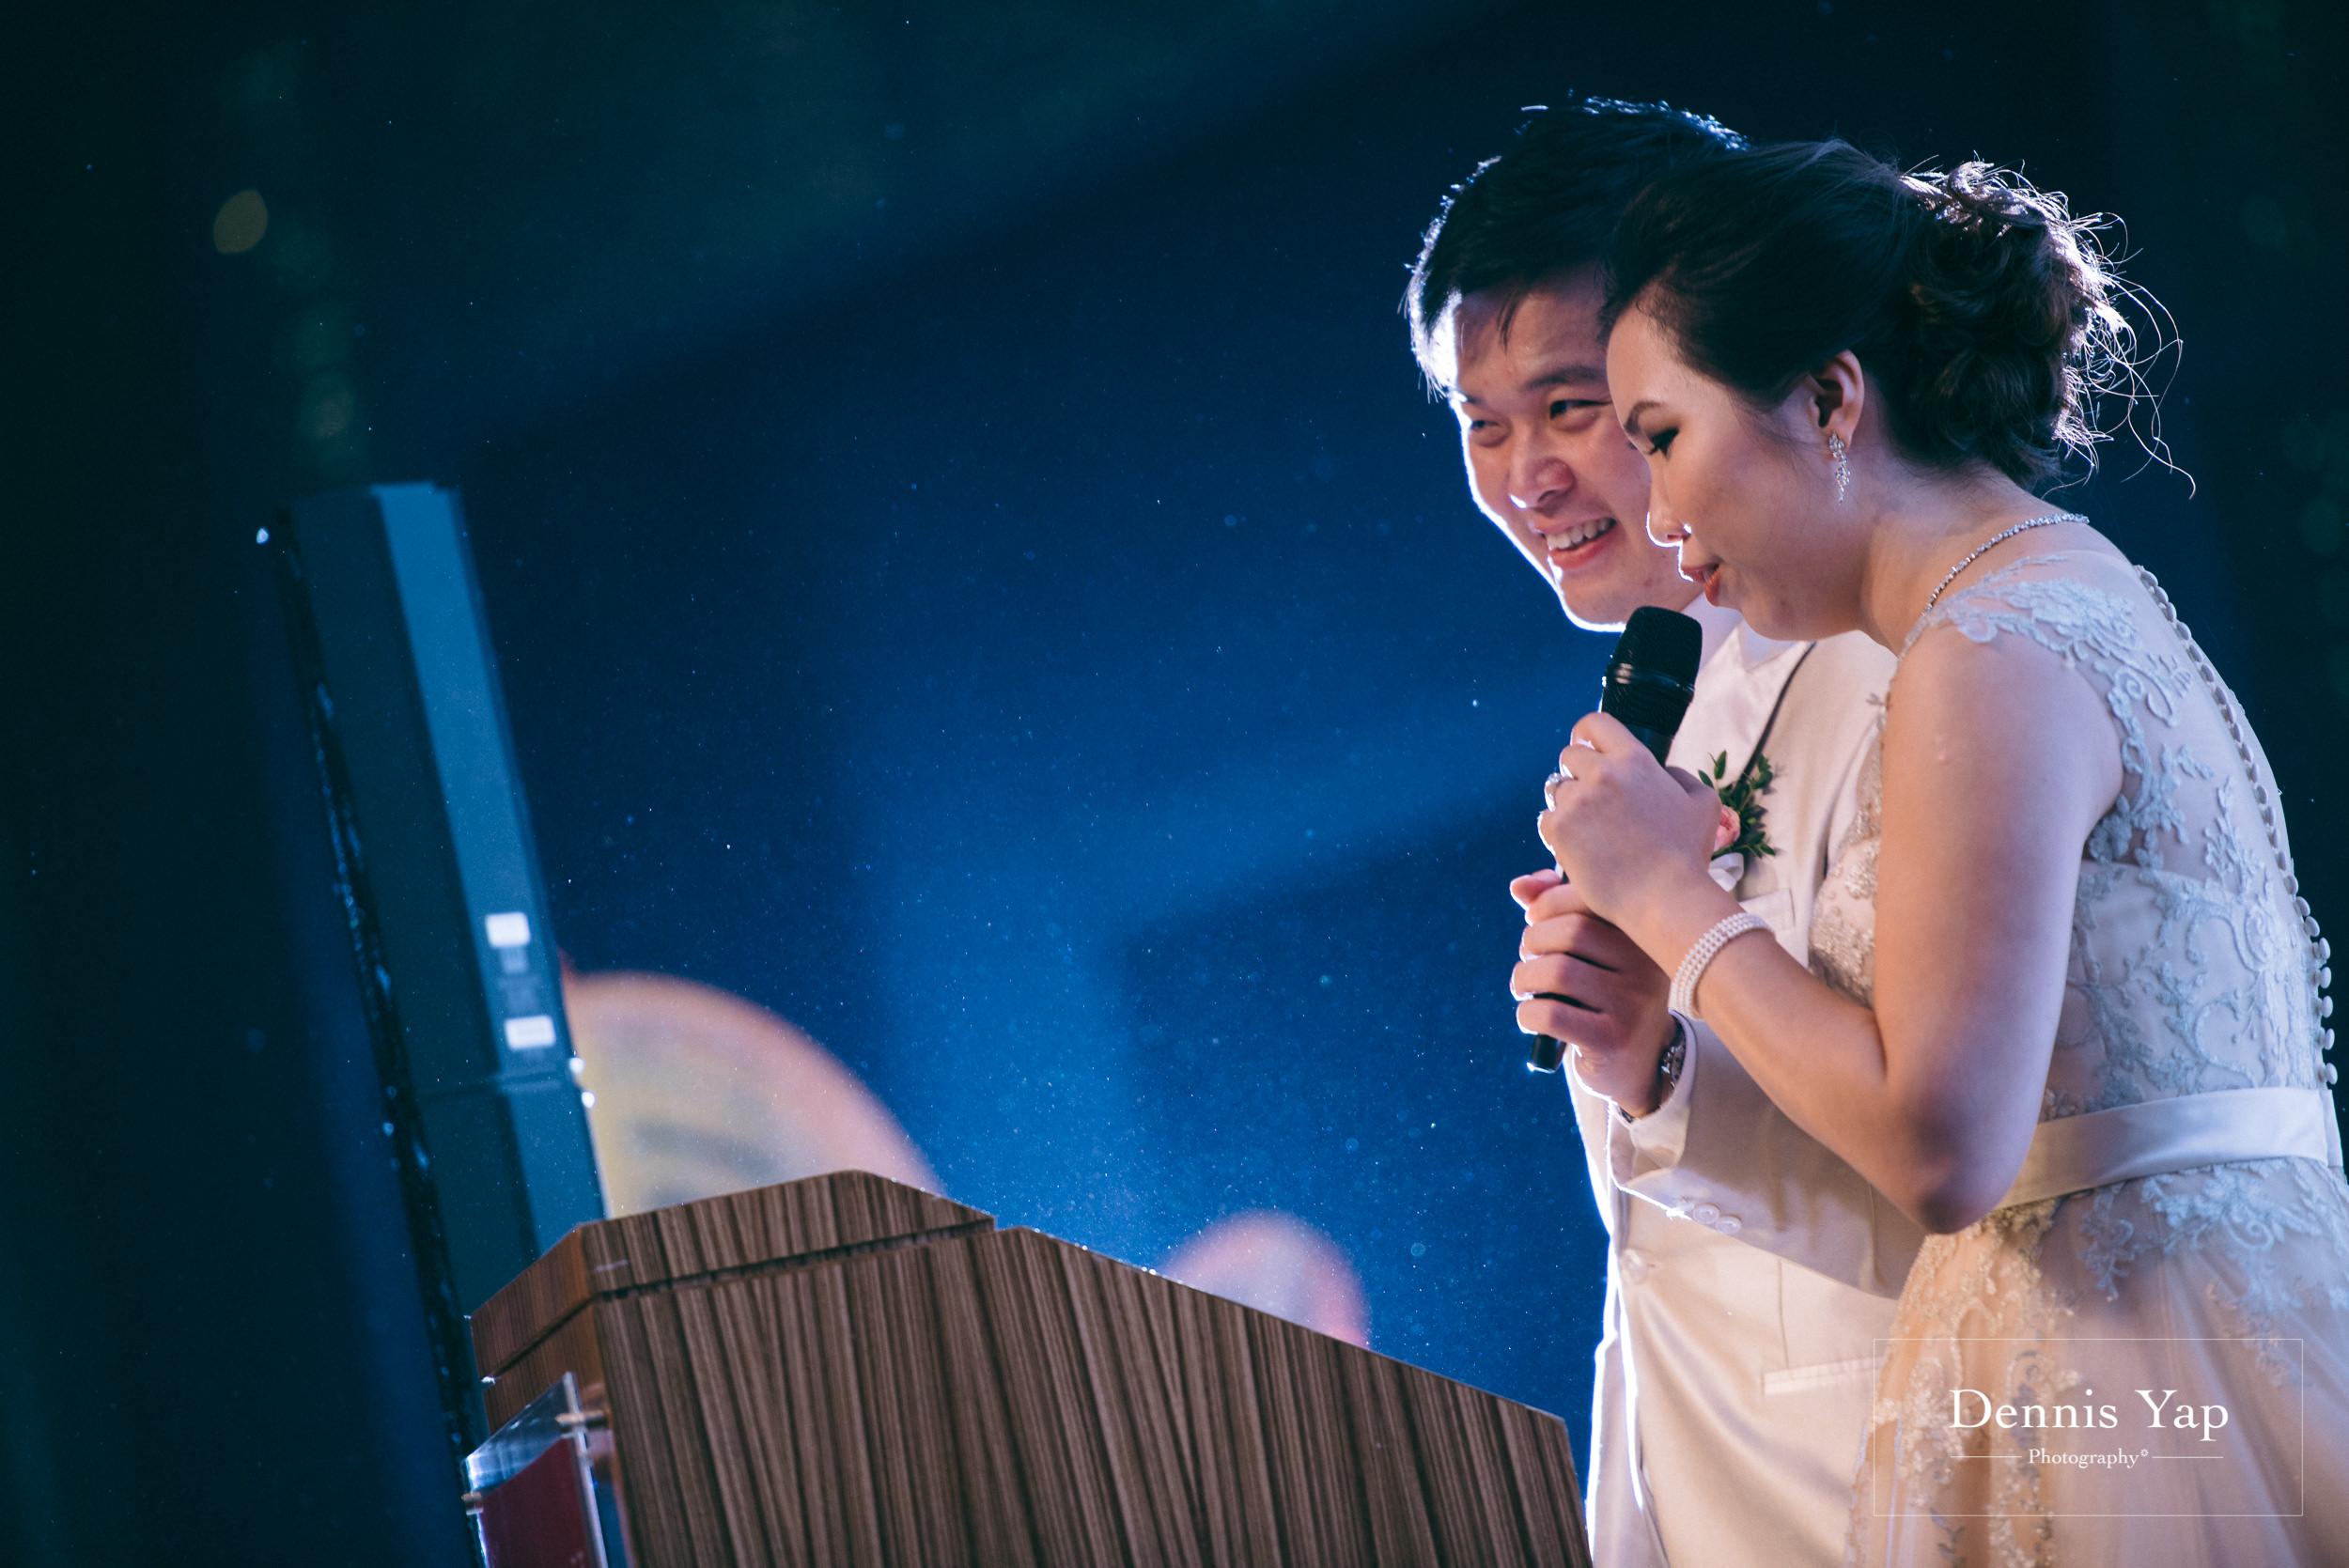 nelson bee yi wedding banquet grand hyatt kuala lumpur dennis yap photography jovita lo wedding-8.jpg